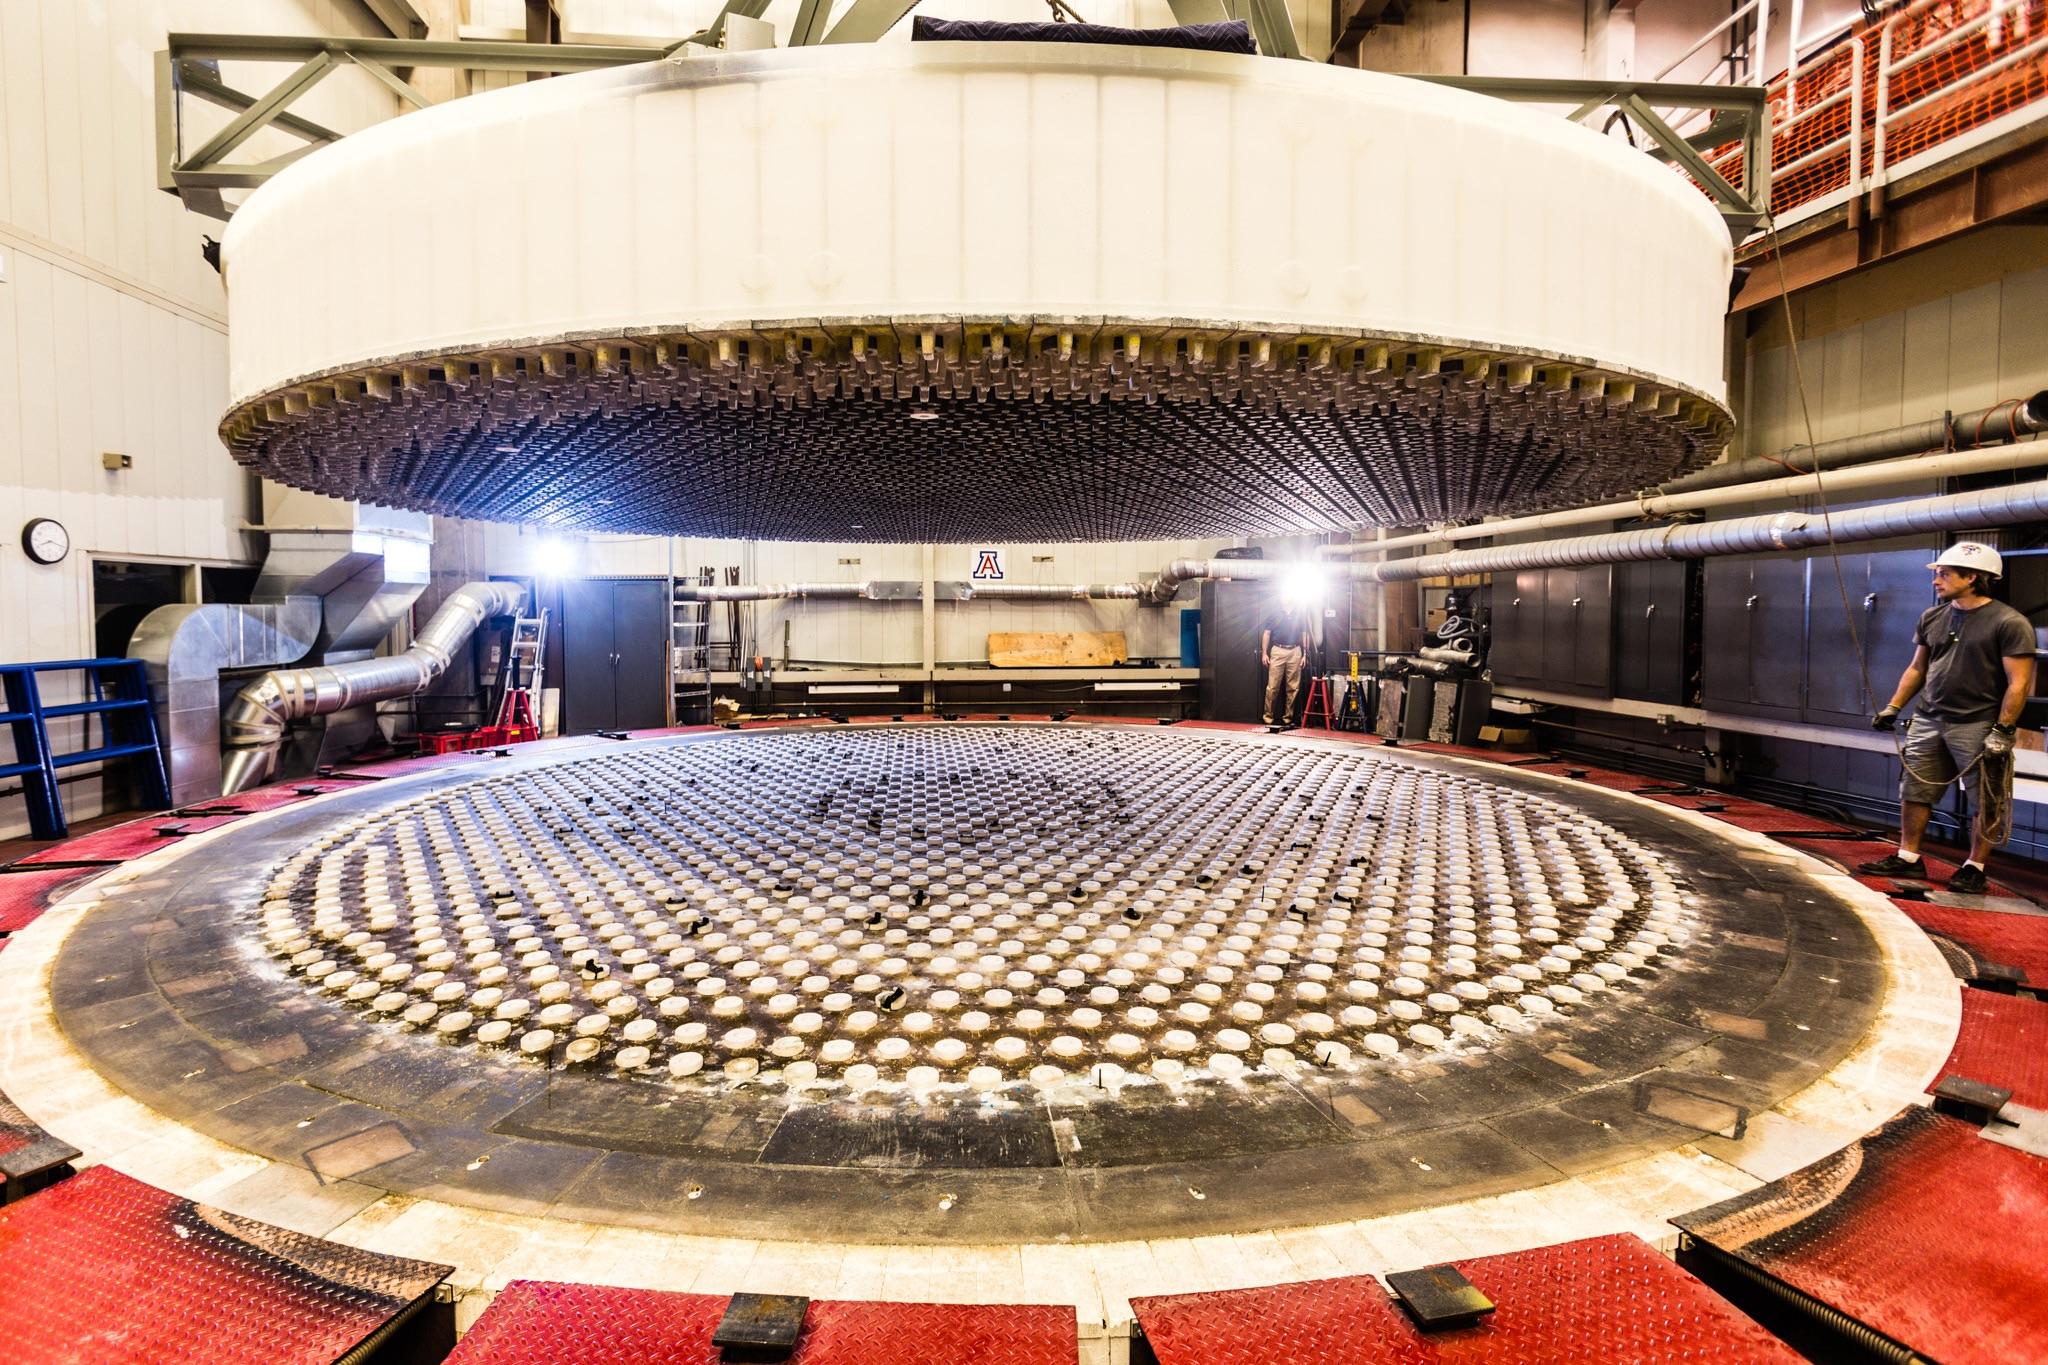 DSC-FT1119 04 mirror production for Giant Magellan Telescope